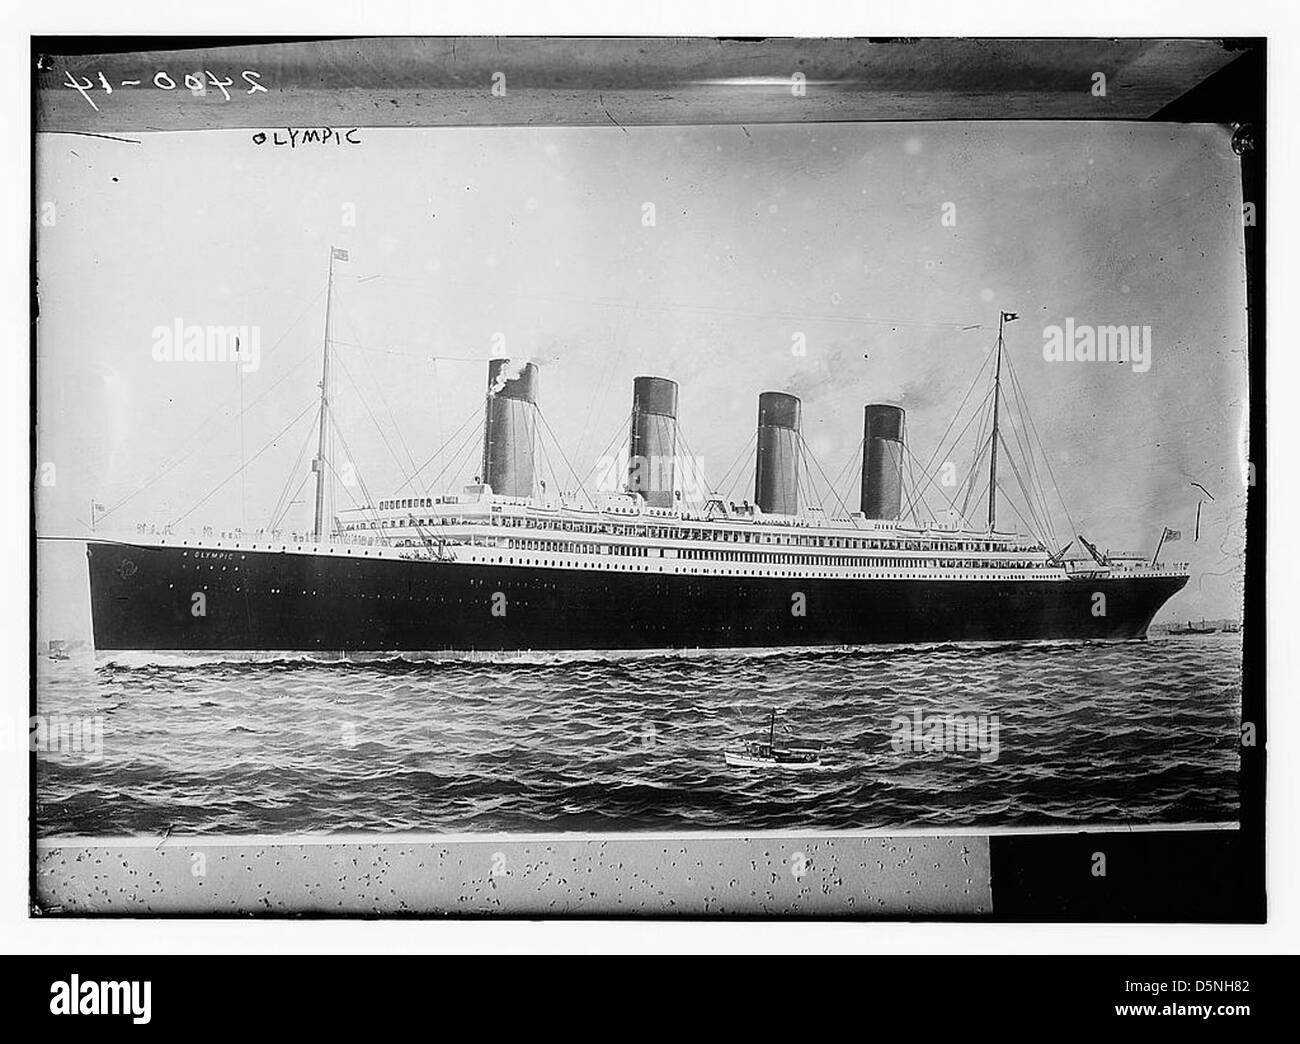 OLYMPIC (LOC) - Stock Image